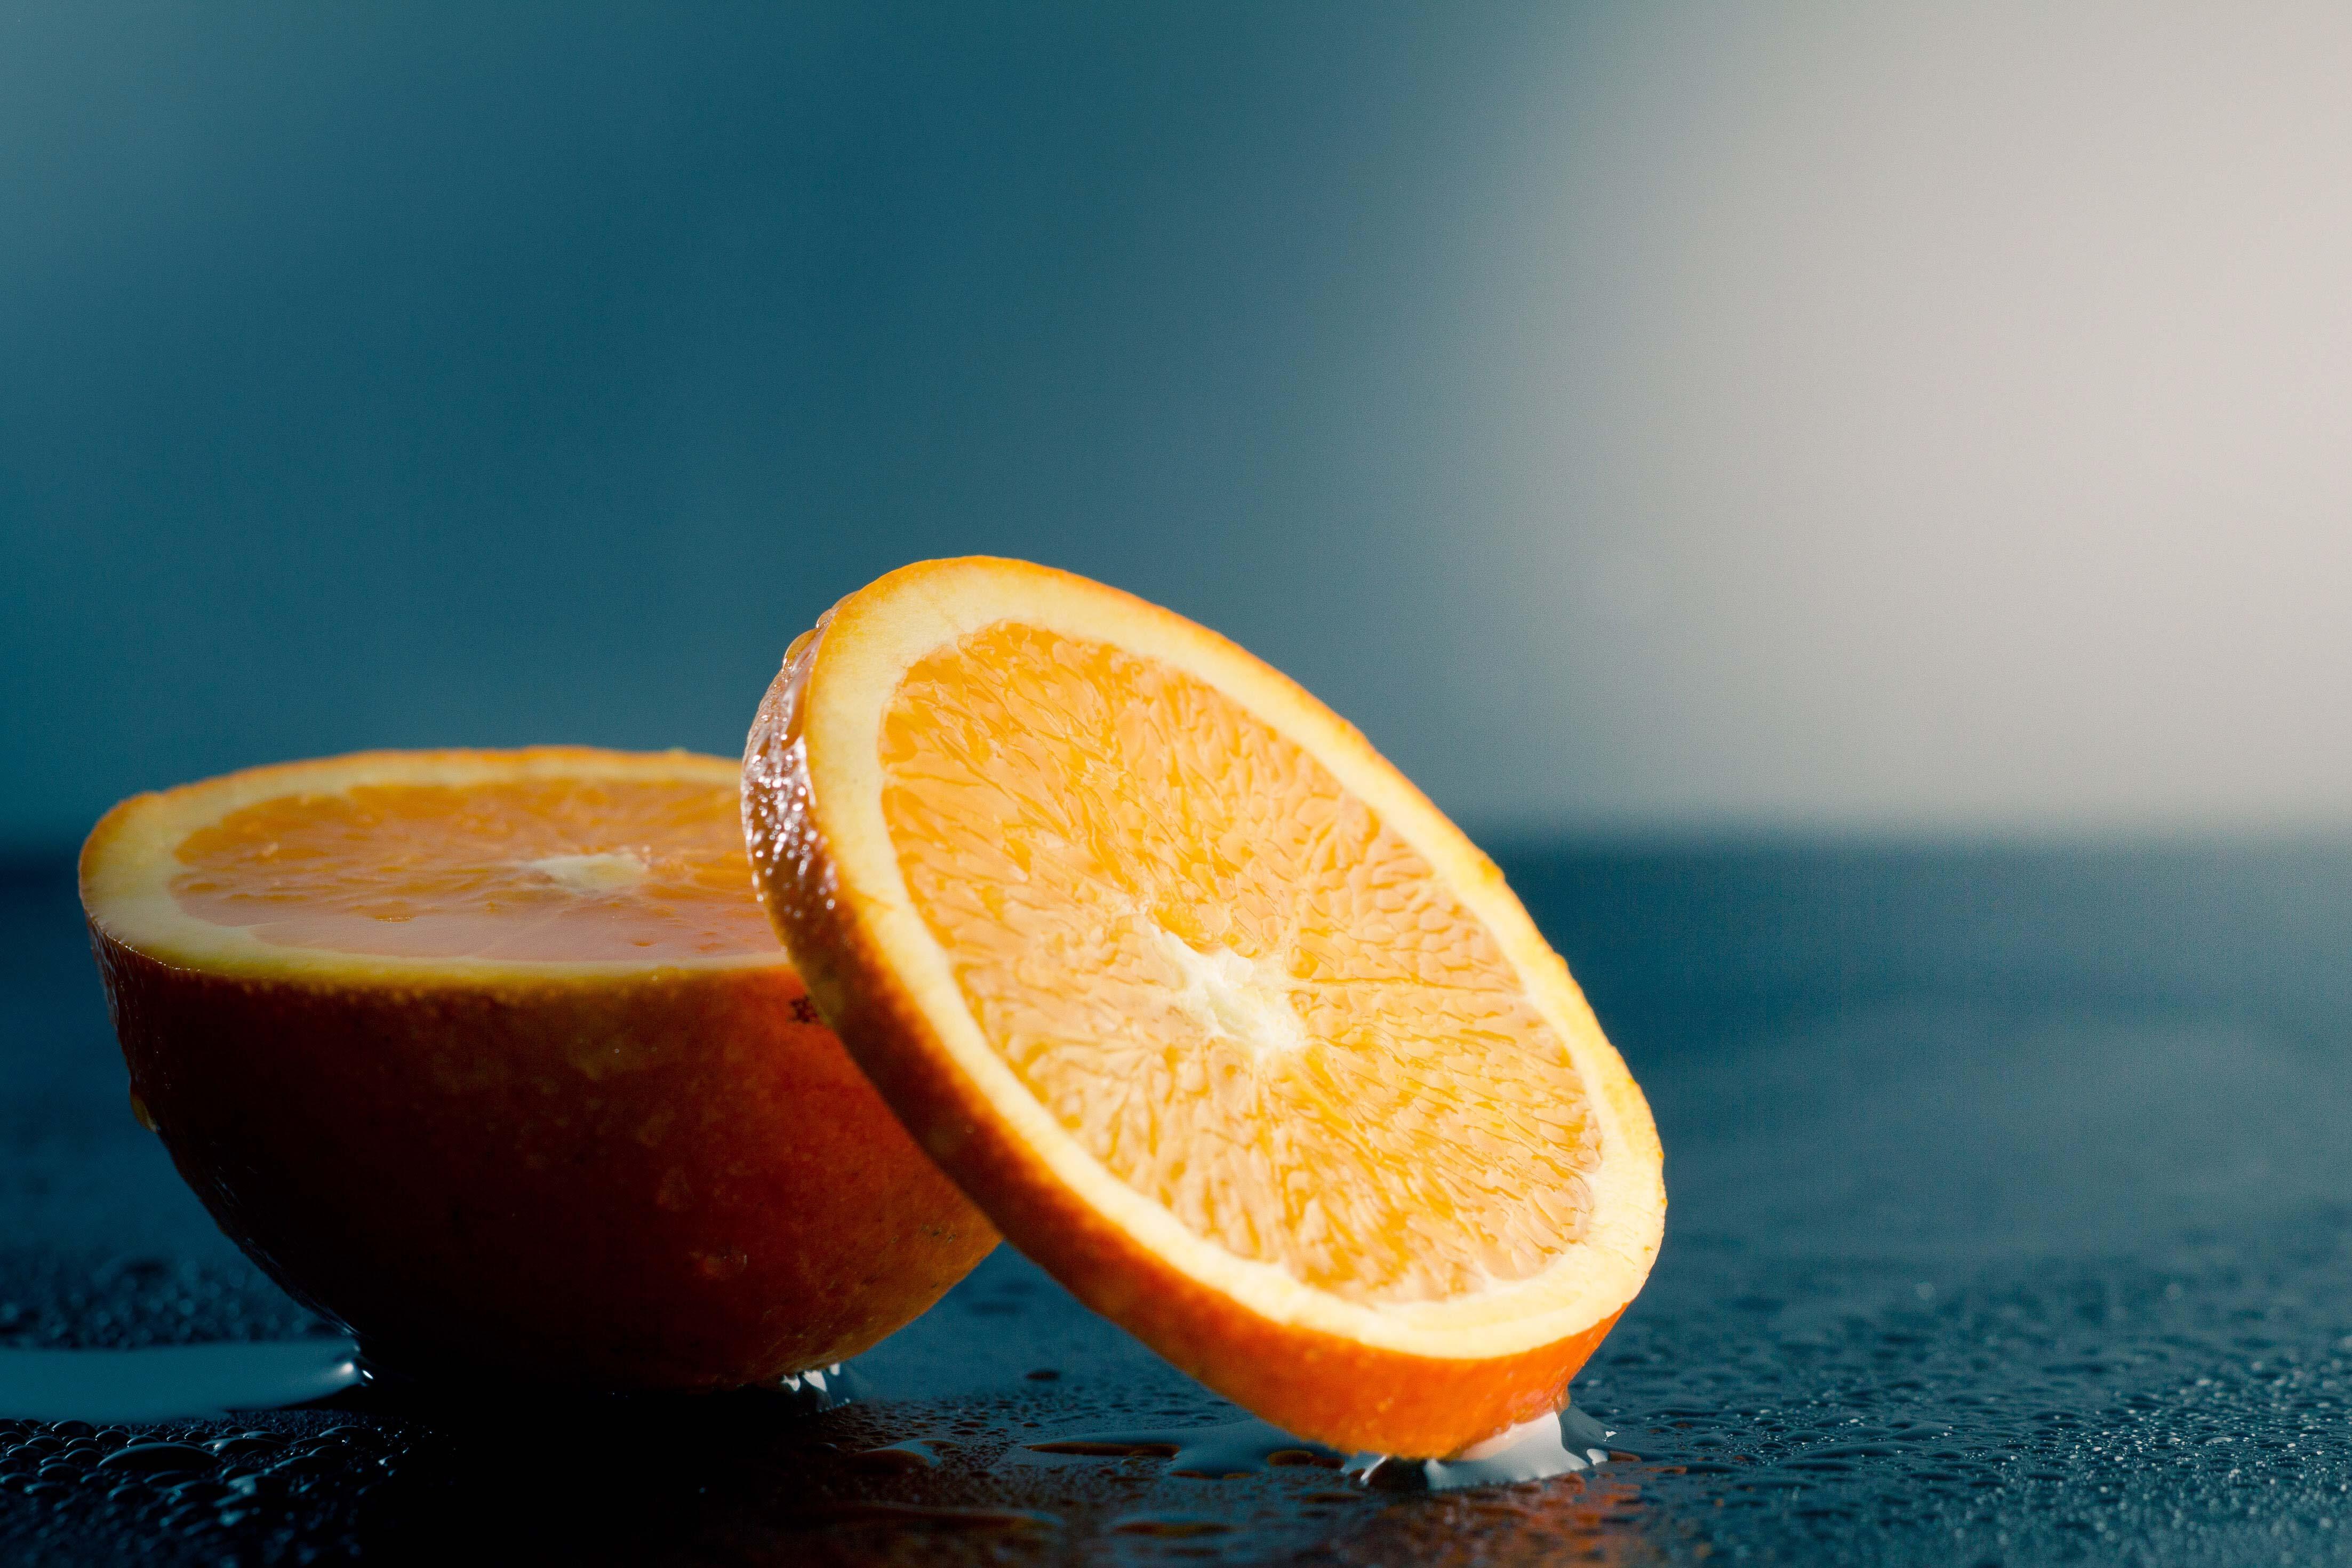 Orange Wallpaper 4410x2940